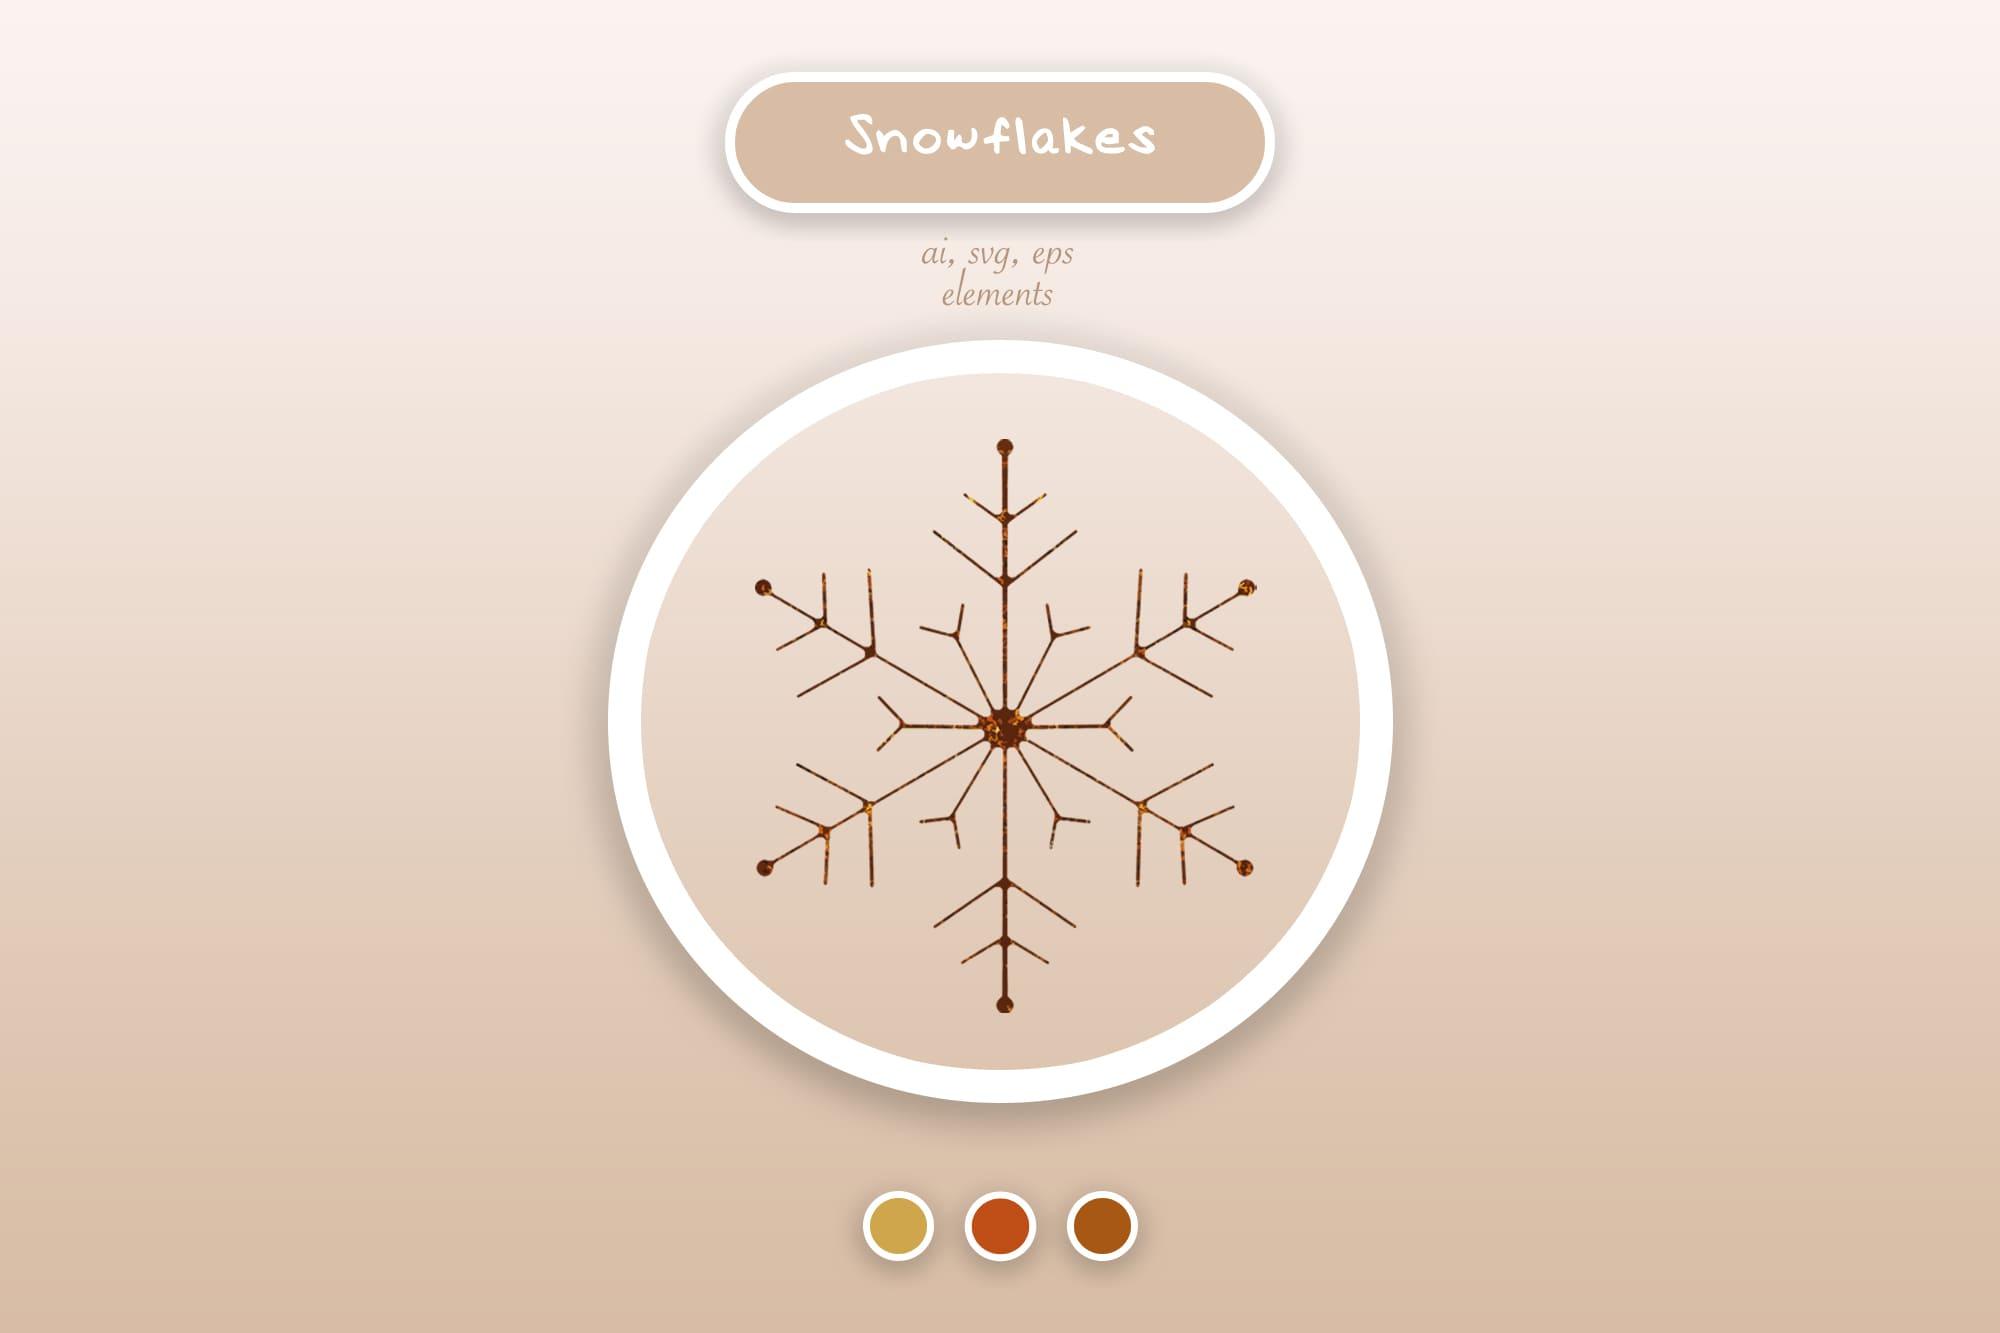 496 Christmas Illustrations: Christmas Vectors Bundle SVG, EPS, AI - Snowflakes 2a